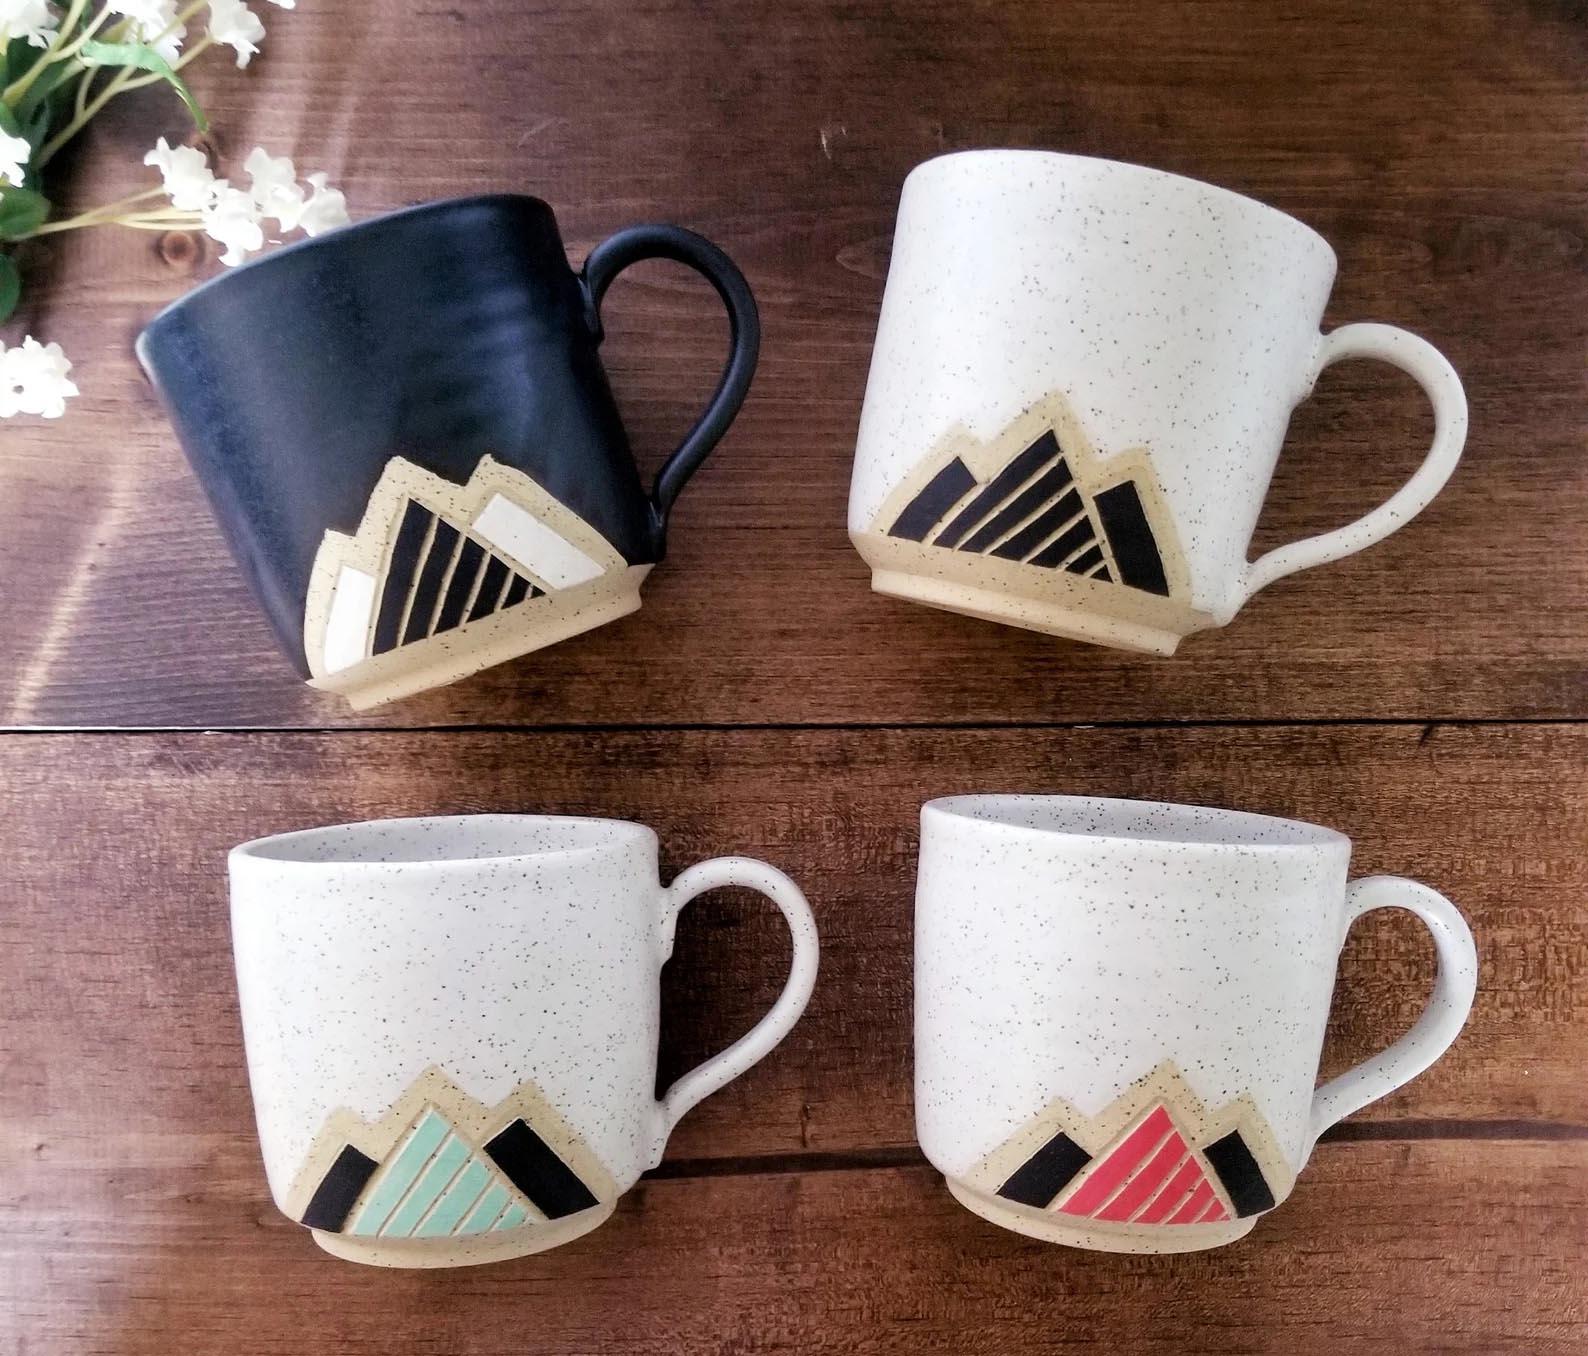 Modern Gift Ideas - Ceramic Mugs with Mountain Design.